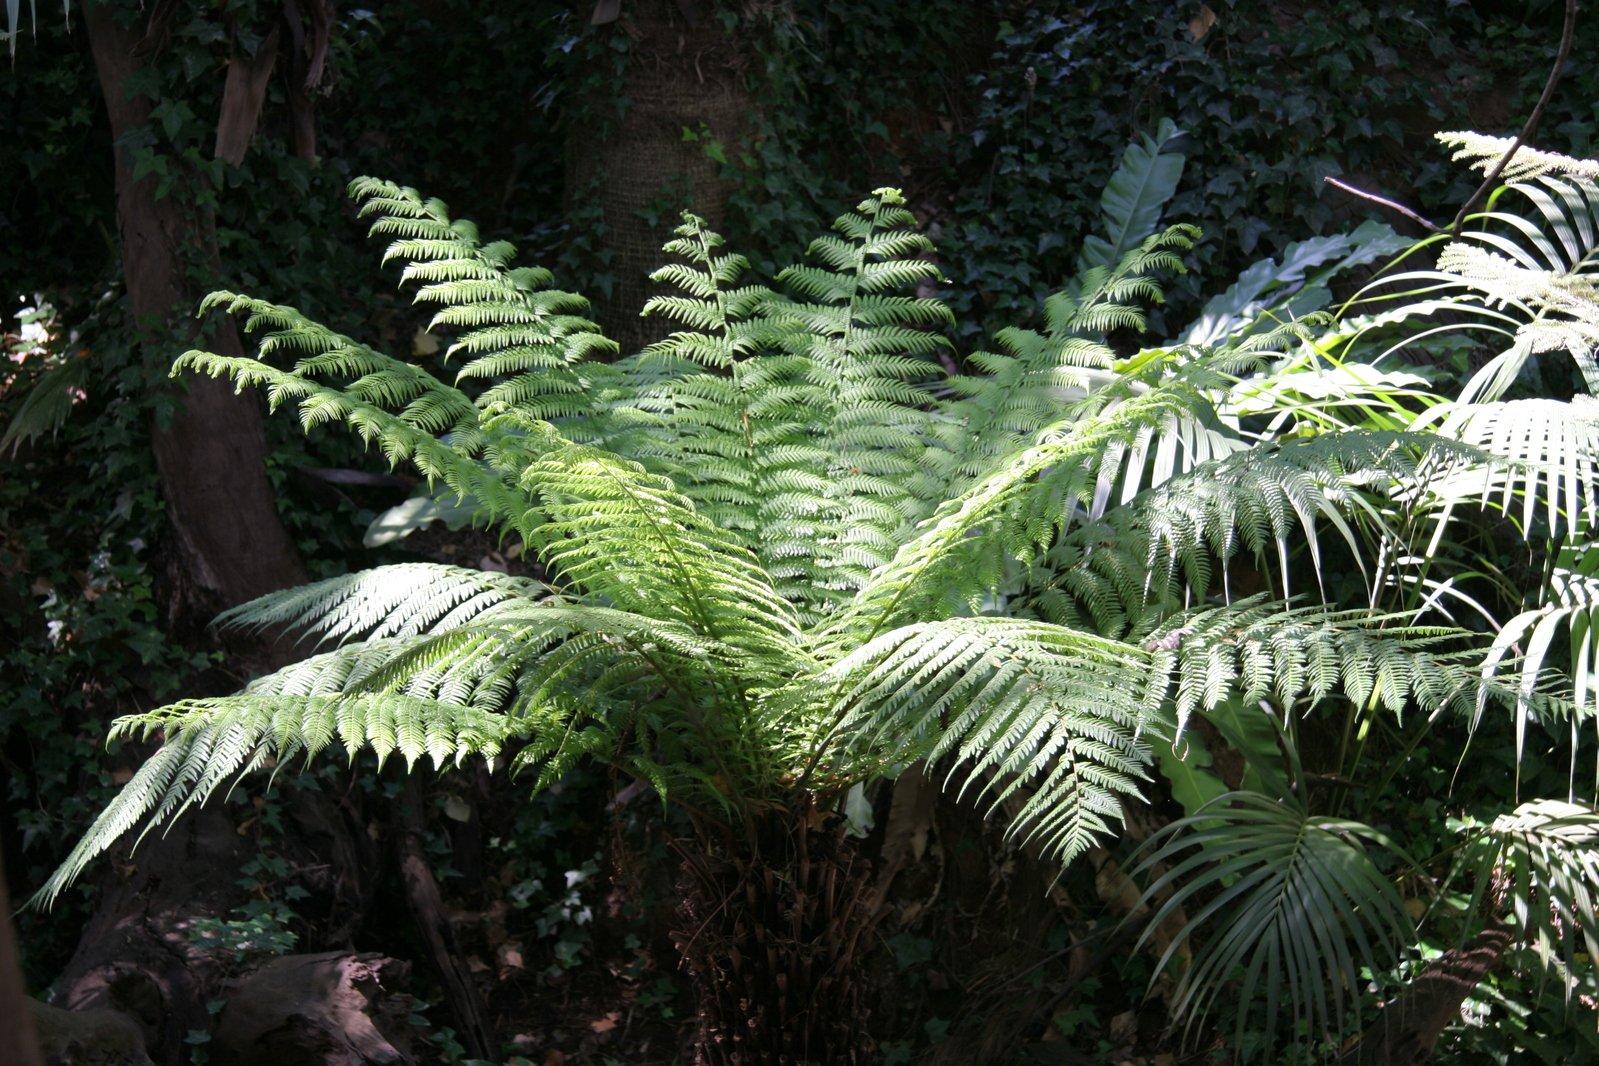 temperate rainforest plants